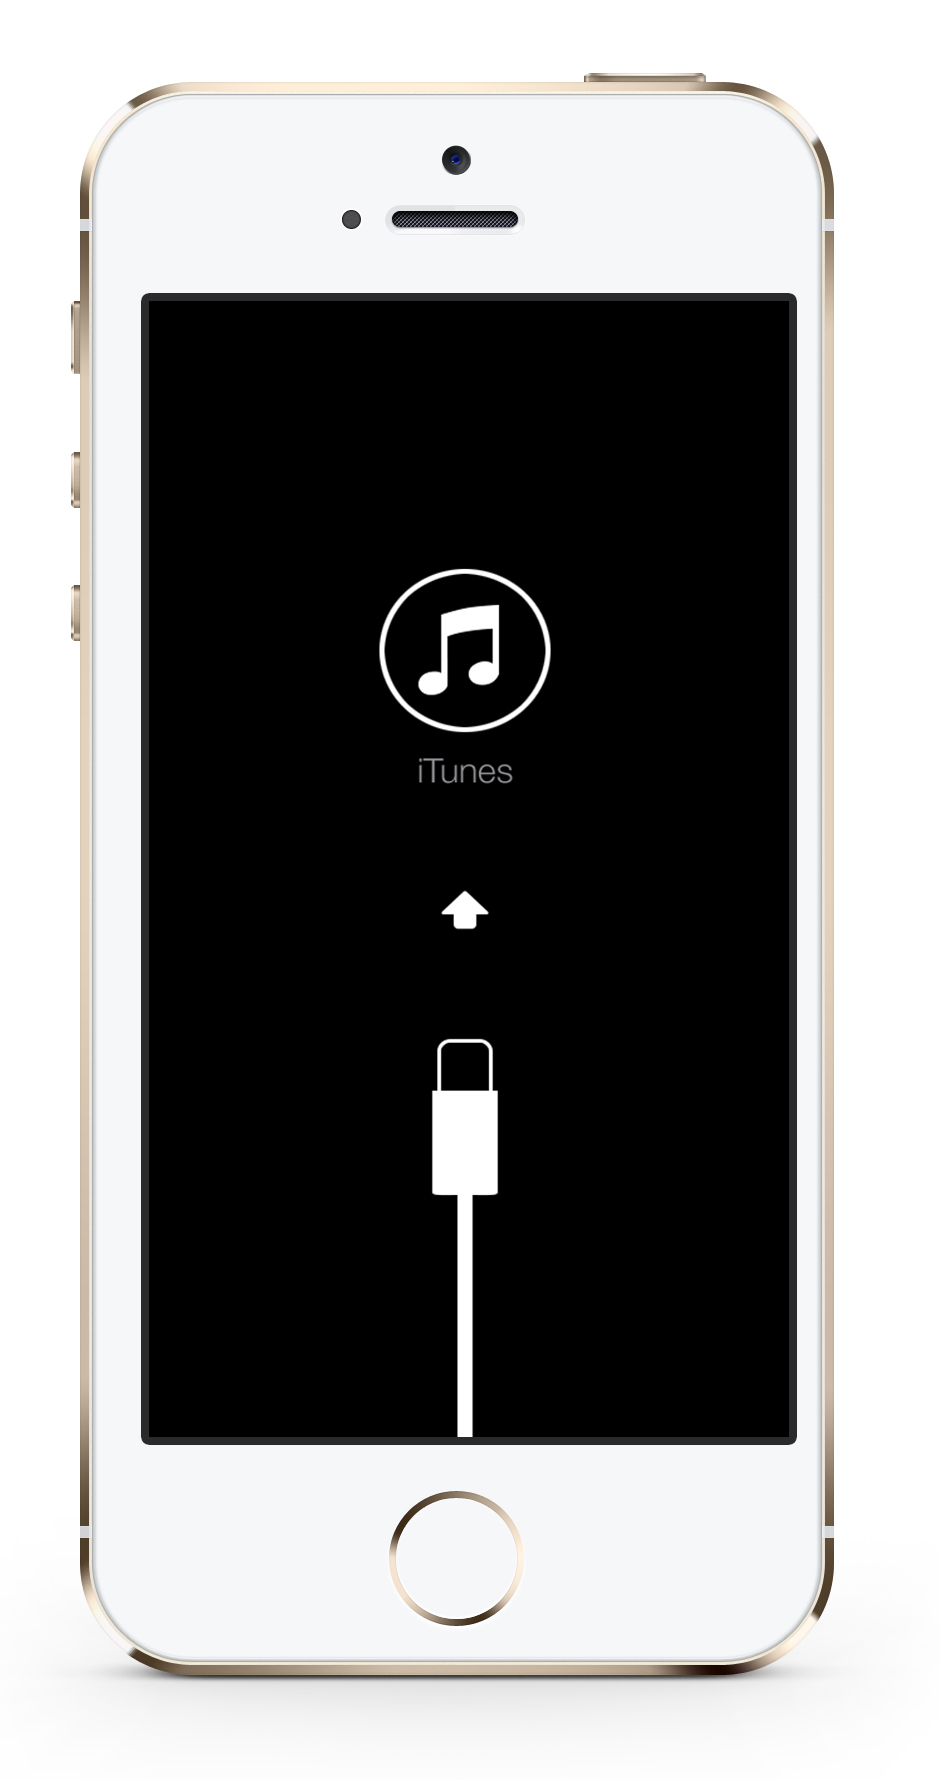 iphone 5s reparatur berlin friedrichshain. Black Bedroom Furniture Sets. Home Design Ideas